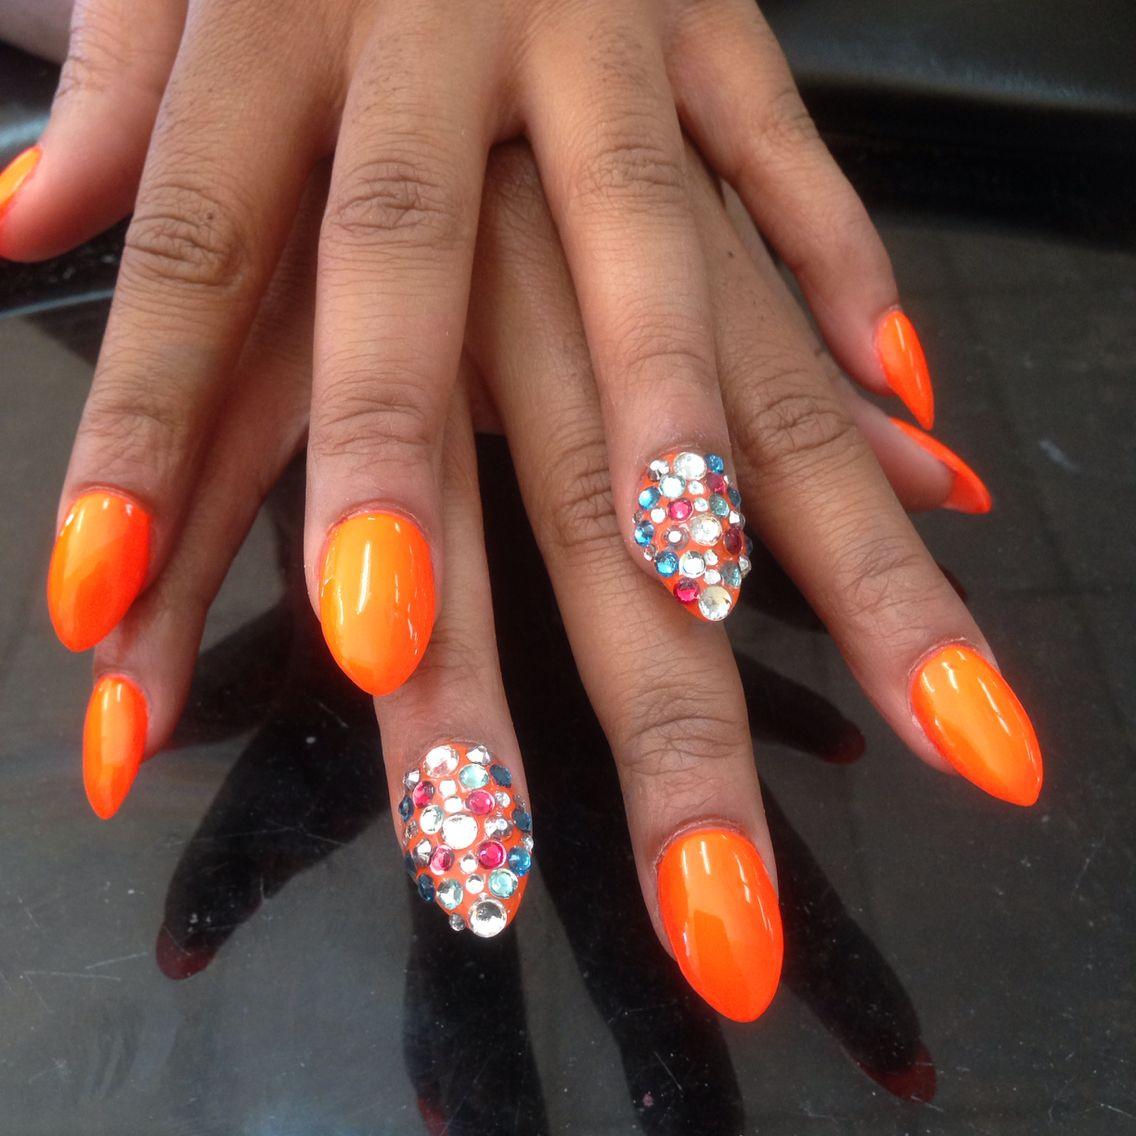 Orange rhinestone nail design - Orange Rhinestone Nail Design Acrylic Nail Pinterest